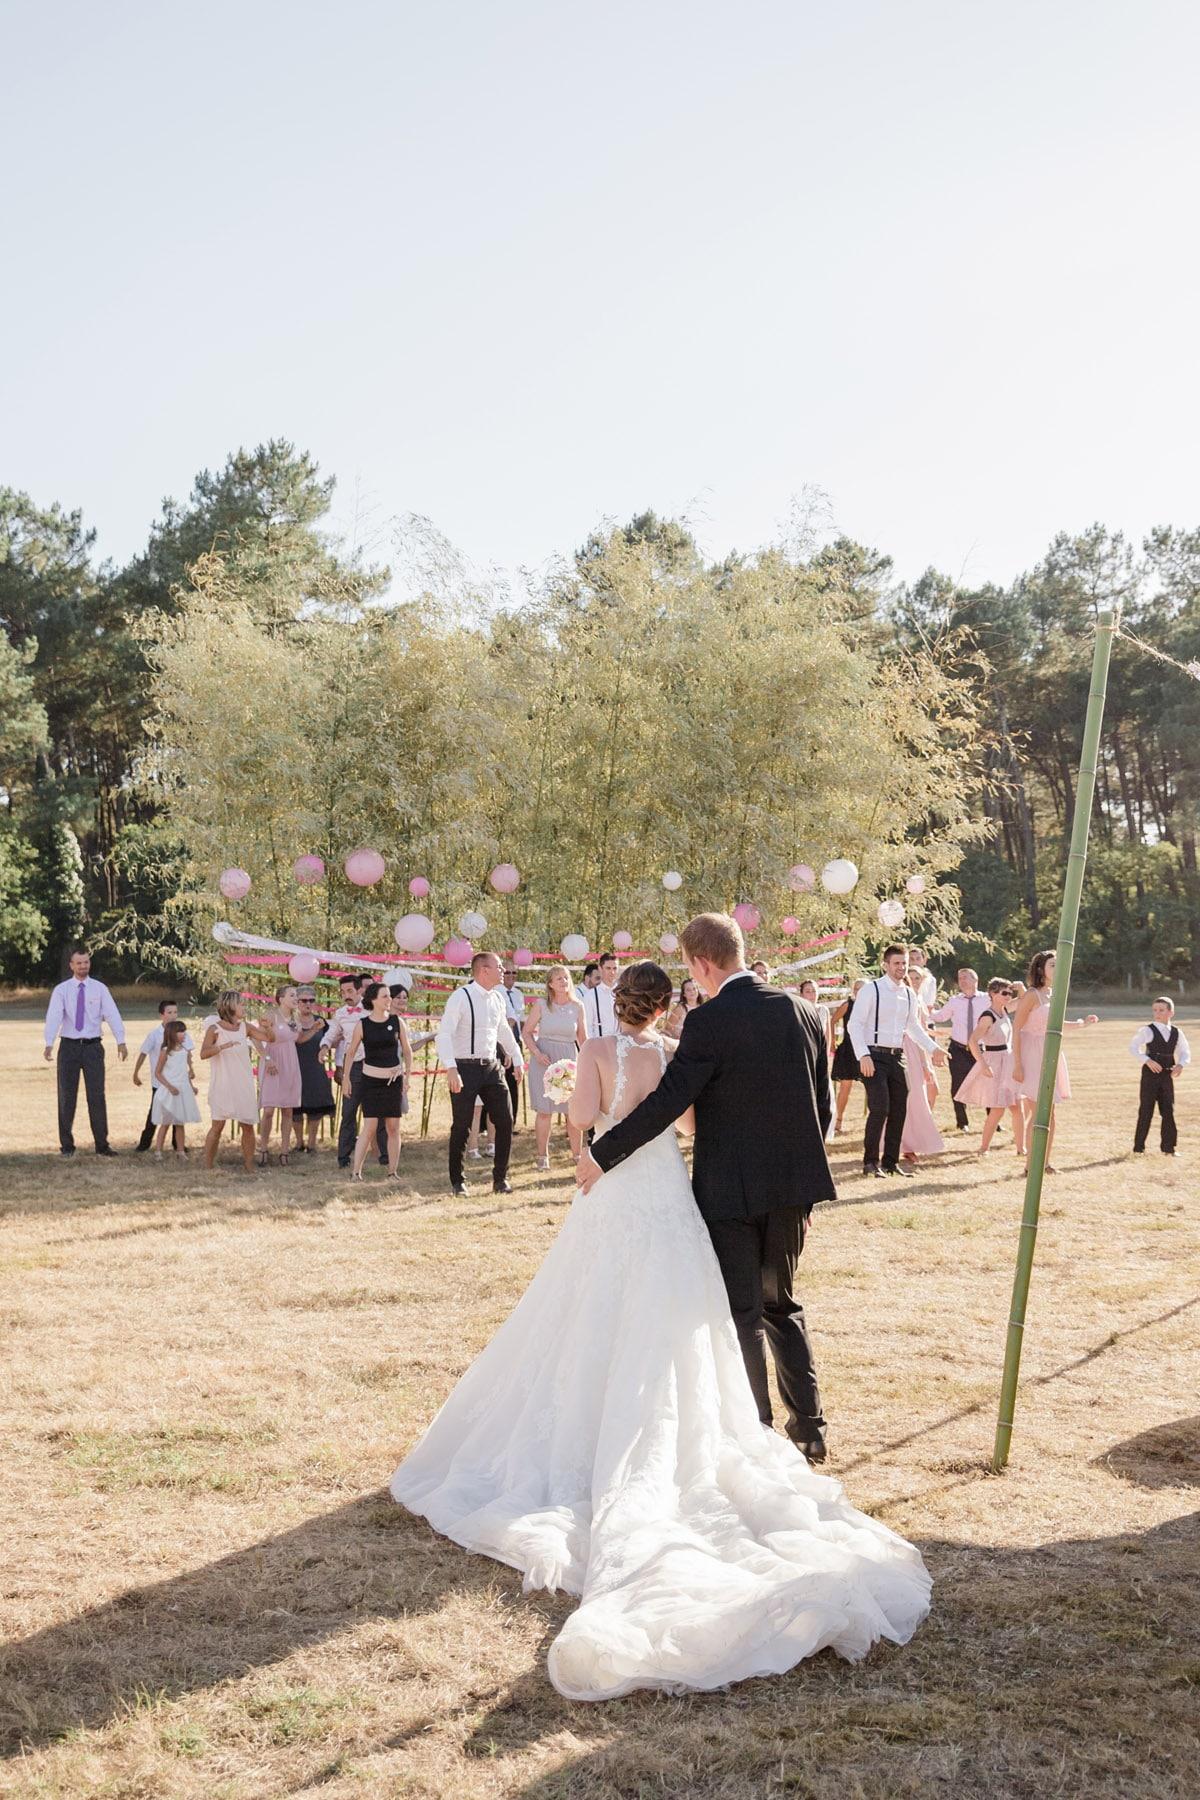 cocktail mariage diy photographe mariage bordeaux landes fineart francais sarah miramon blog 28